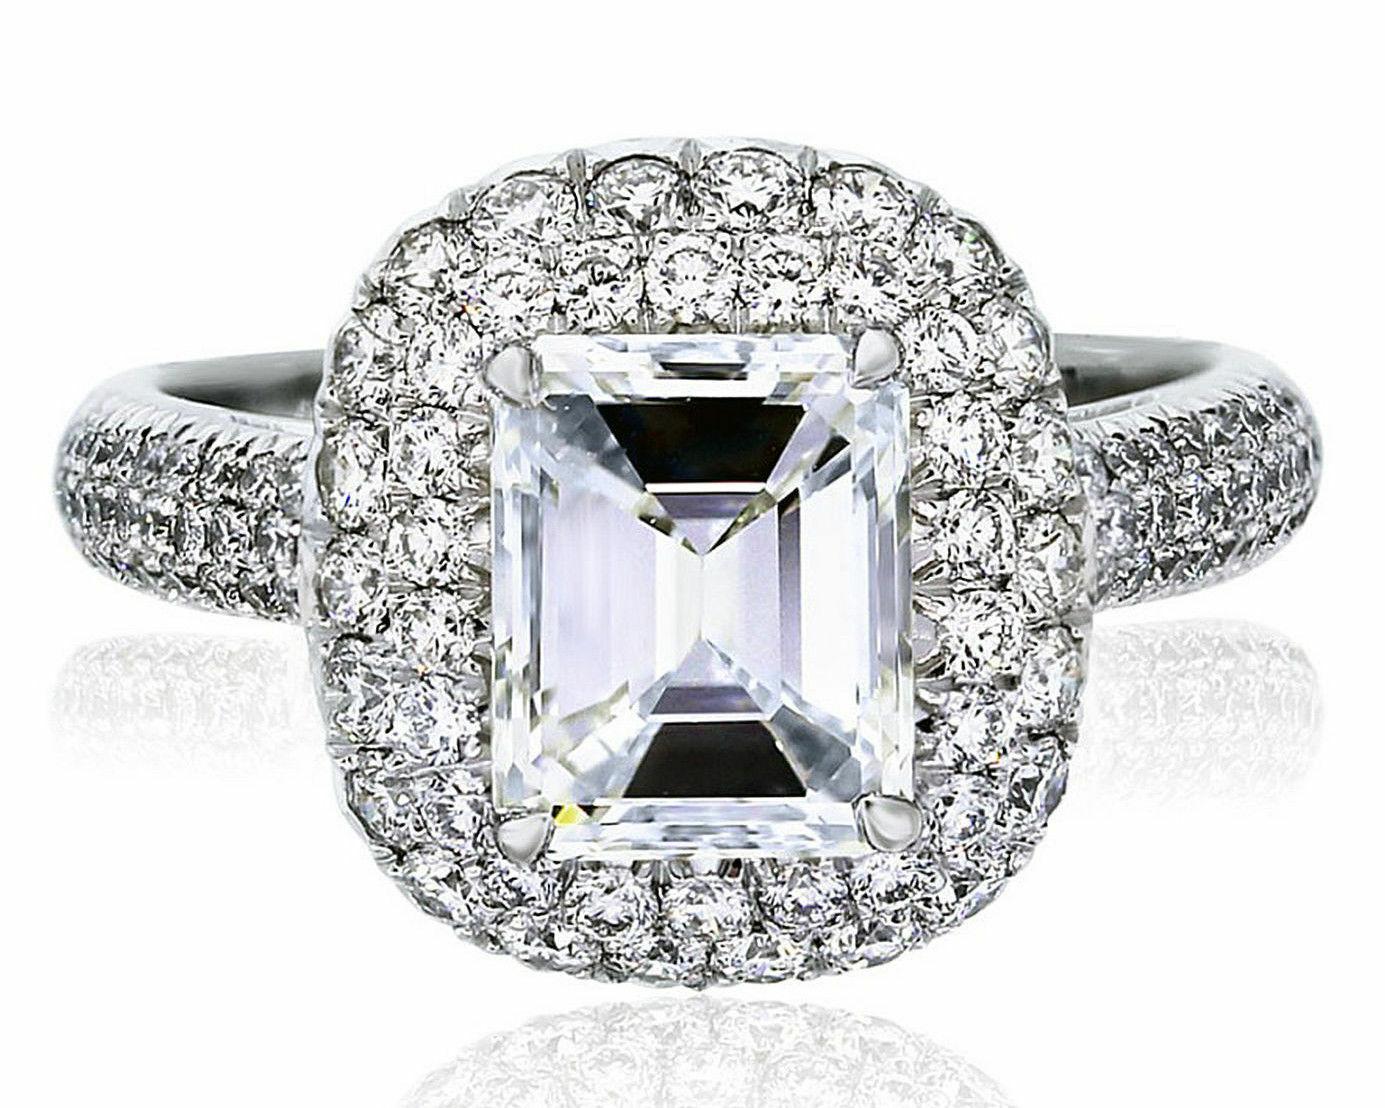 GIA Certified Diamond Engagement Halo Ring 5.25 carat Emerald & Round Cut 18k